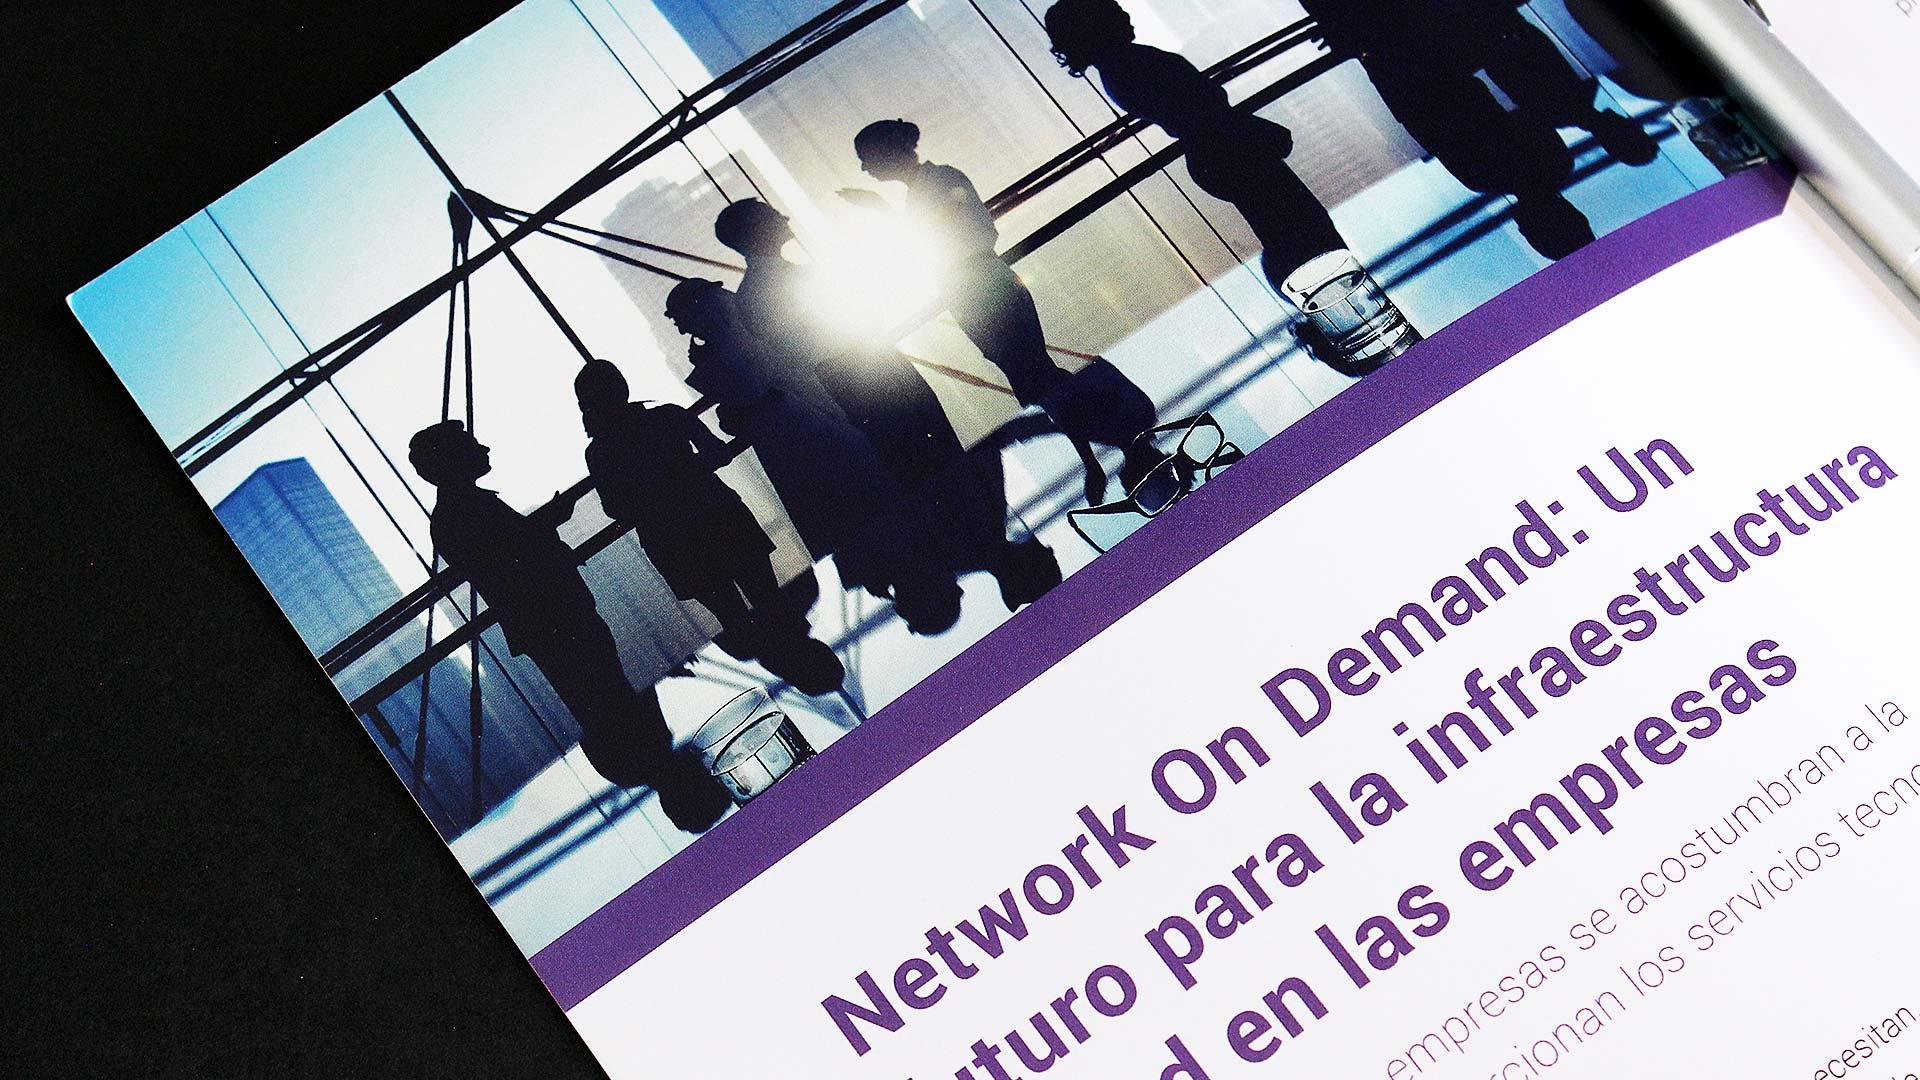 alcatel-content-marketing-informe-resumen-ejecutivo-networkondemand-ebook-2016-11